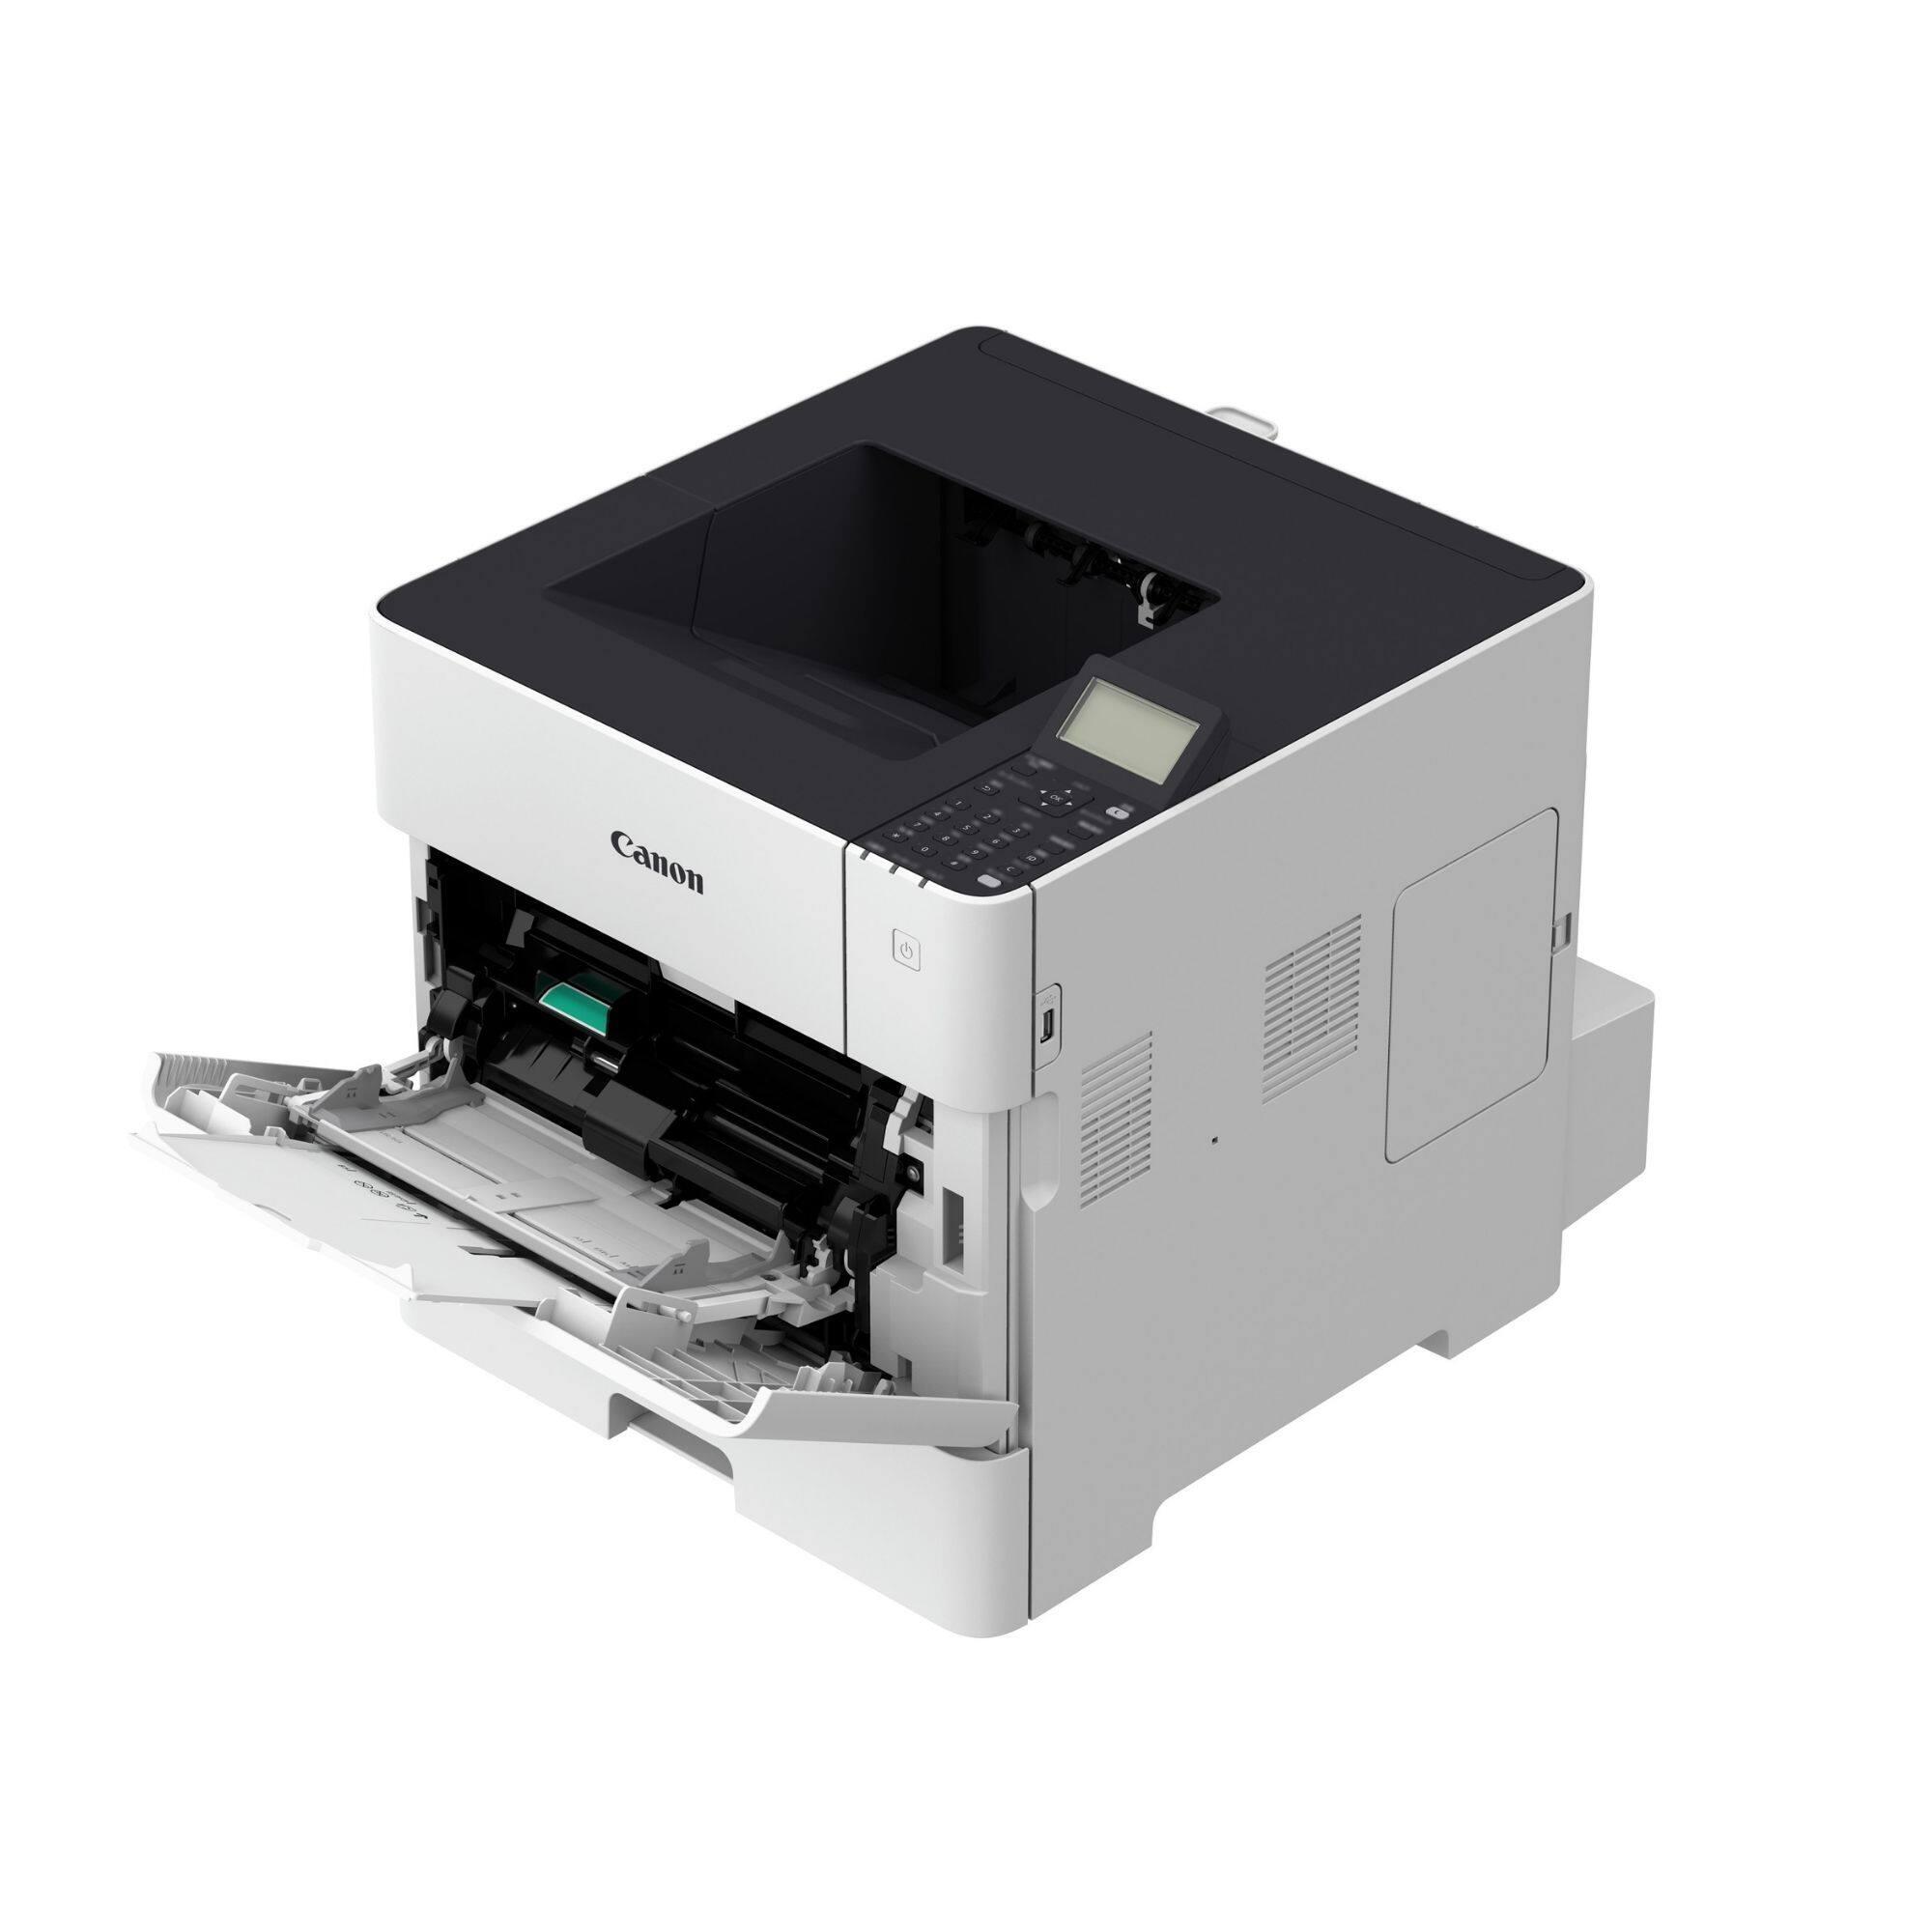 CANON LBP-351X LASER PRINTER (WIFI/Duplex/Airprint)